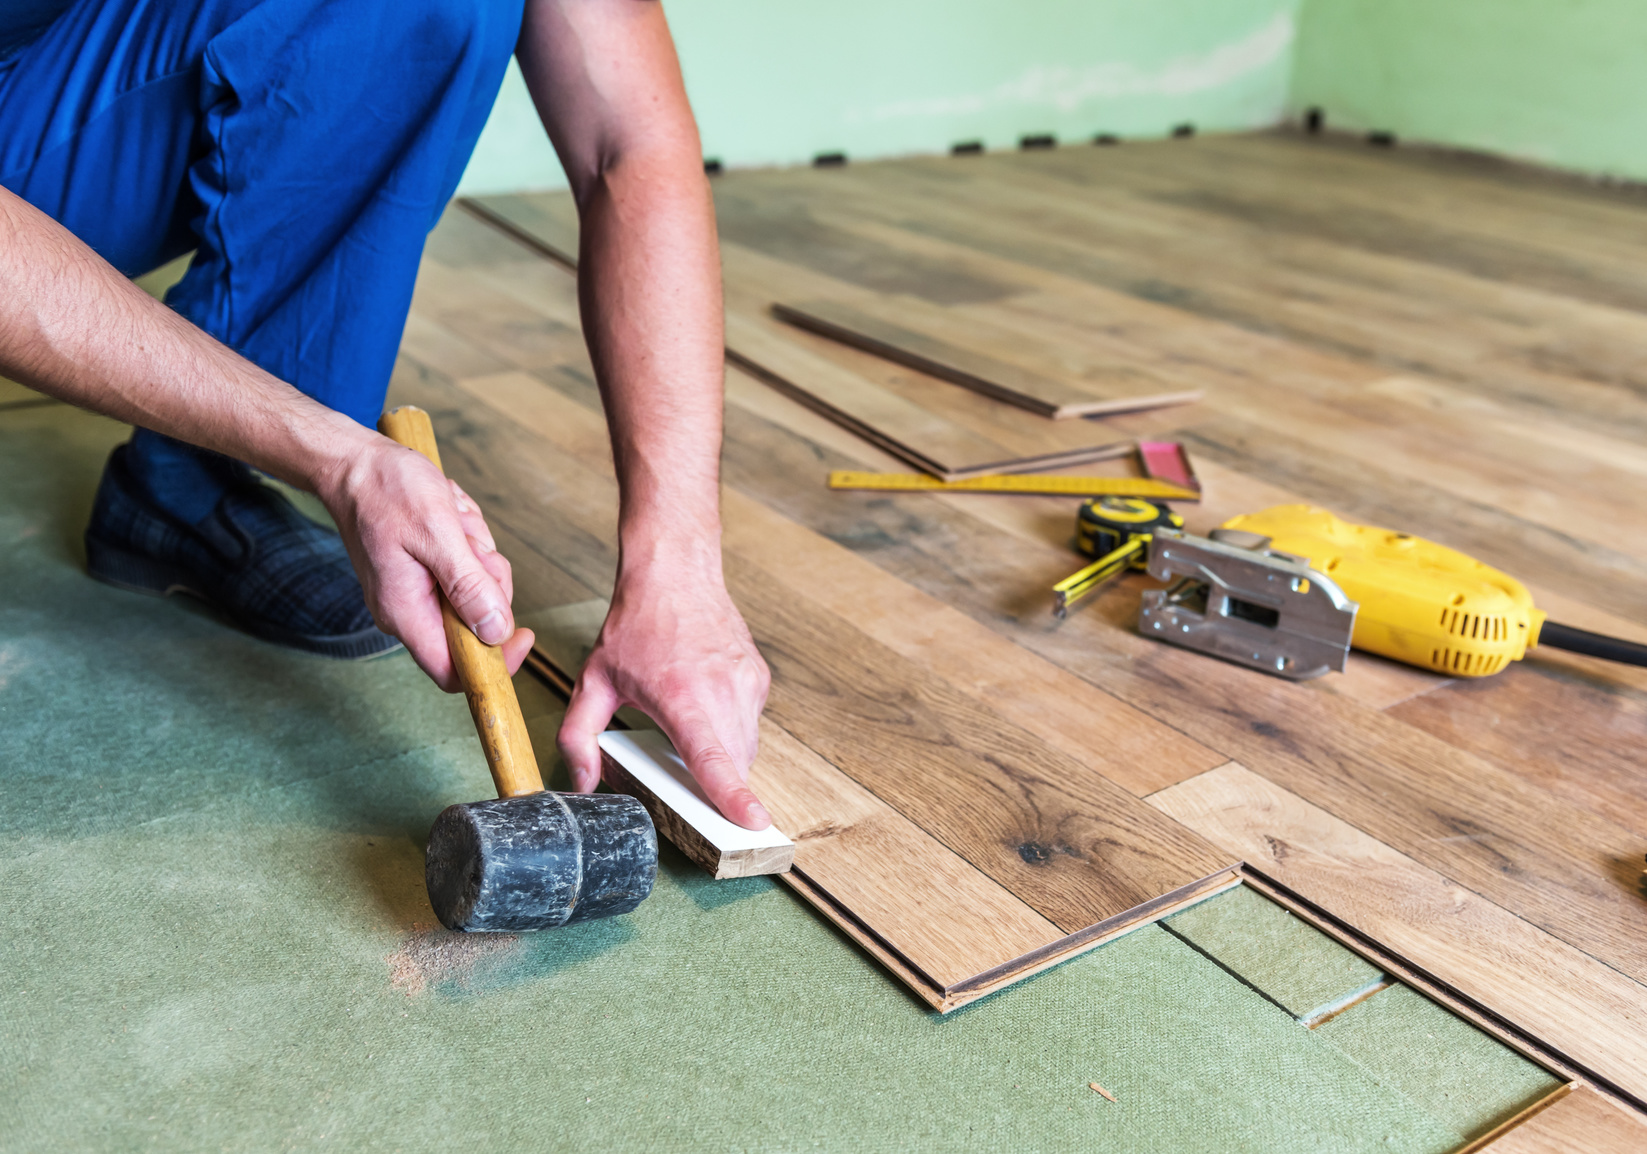 Installing hardwood flooring in a Portland, OR home